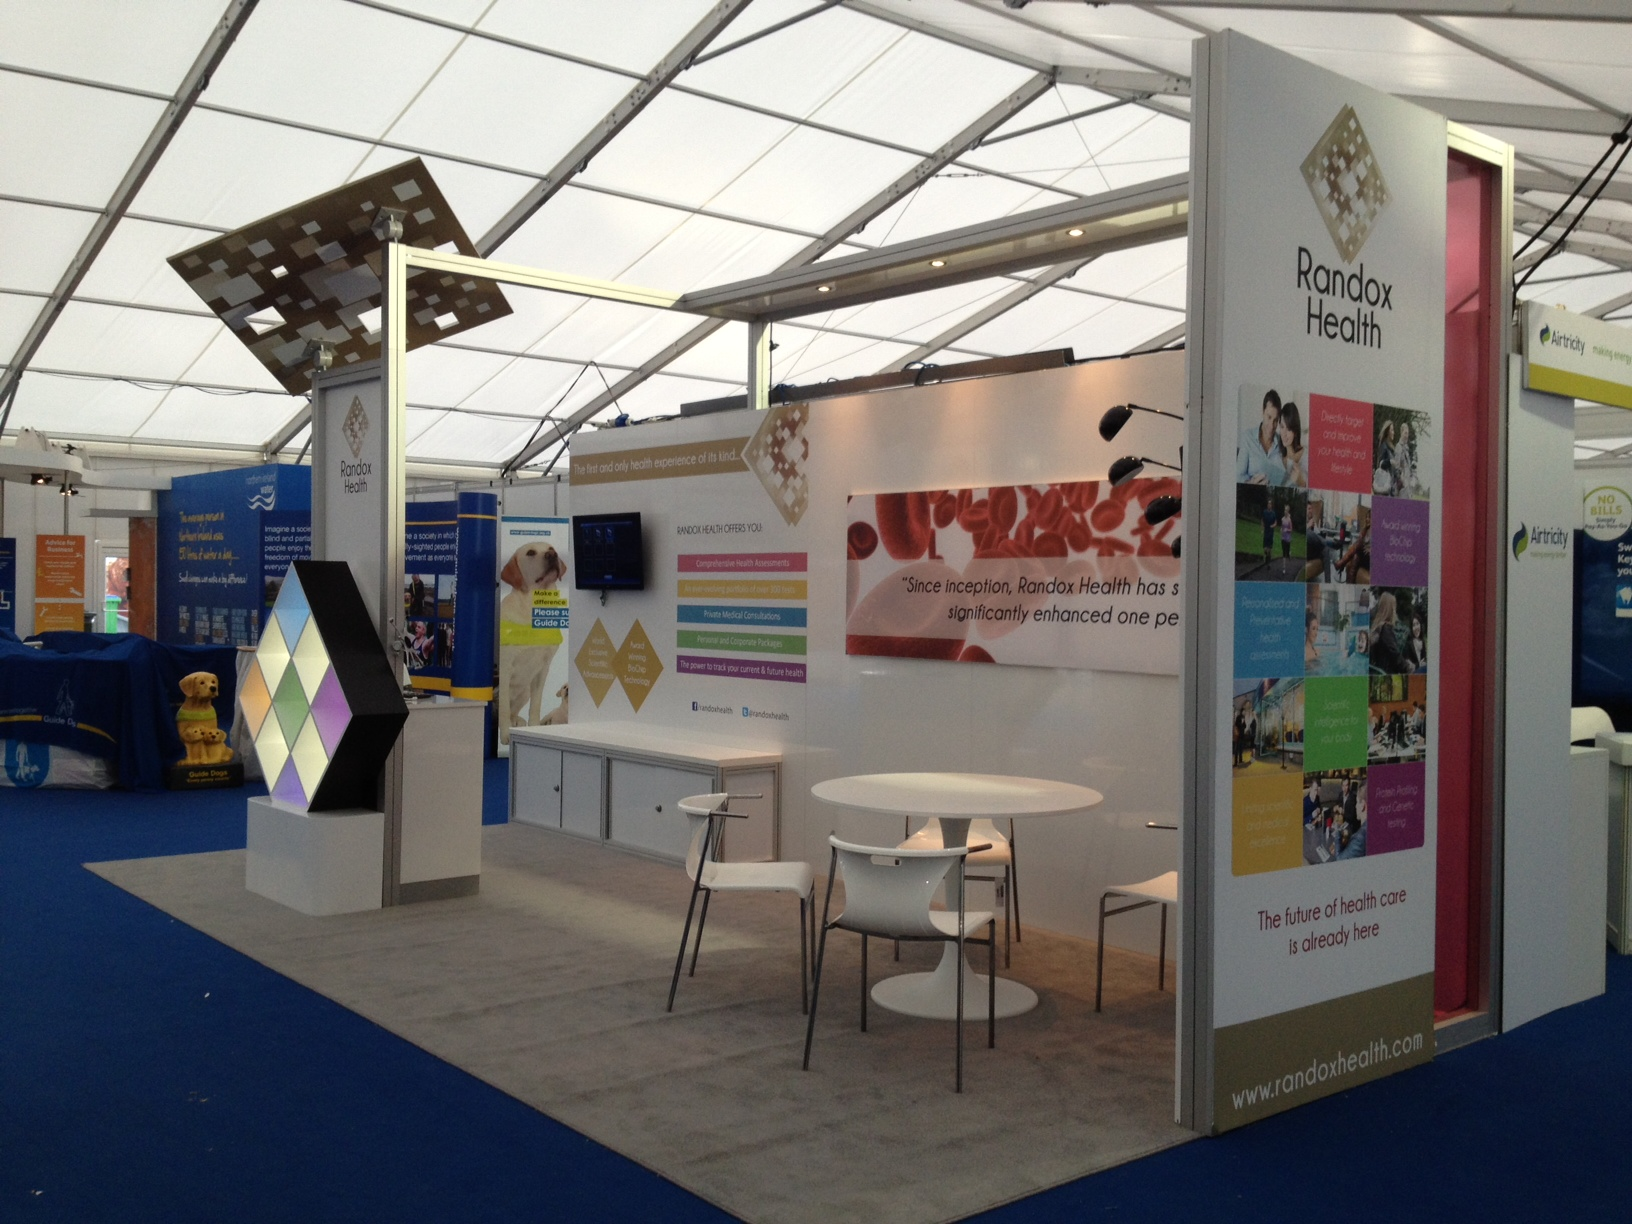 Exhibition Stands Ireland : Designco build randox health exhibition stand at balmoral